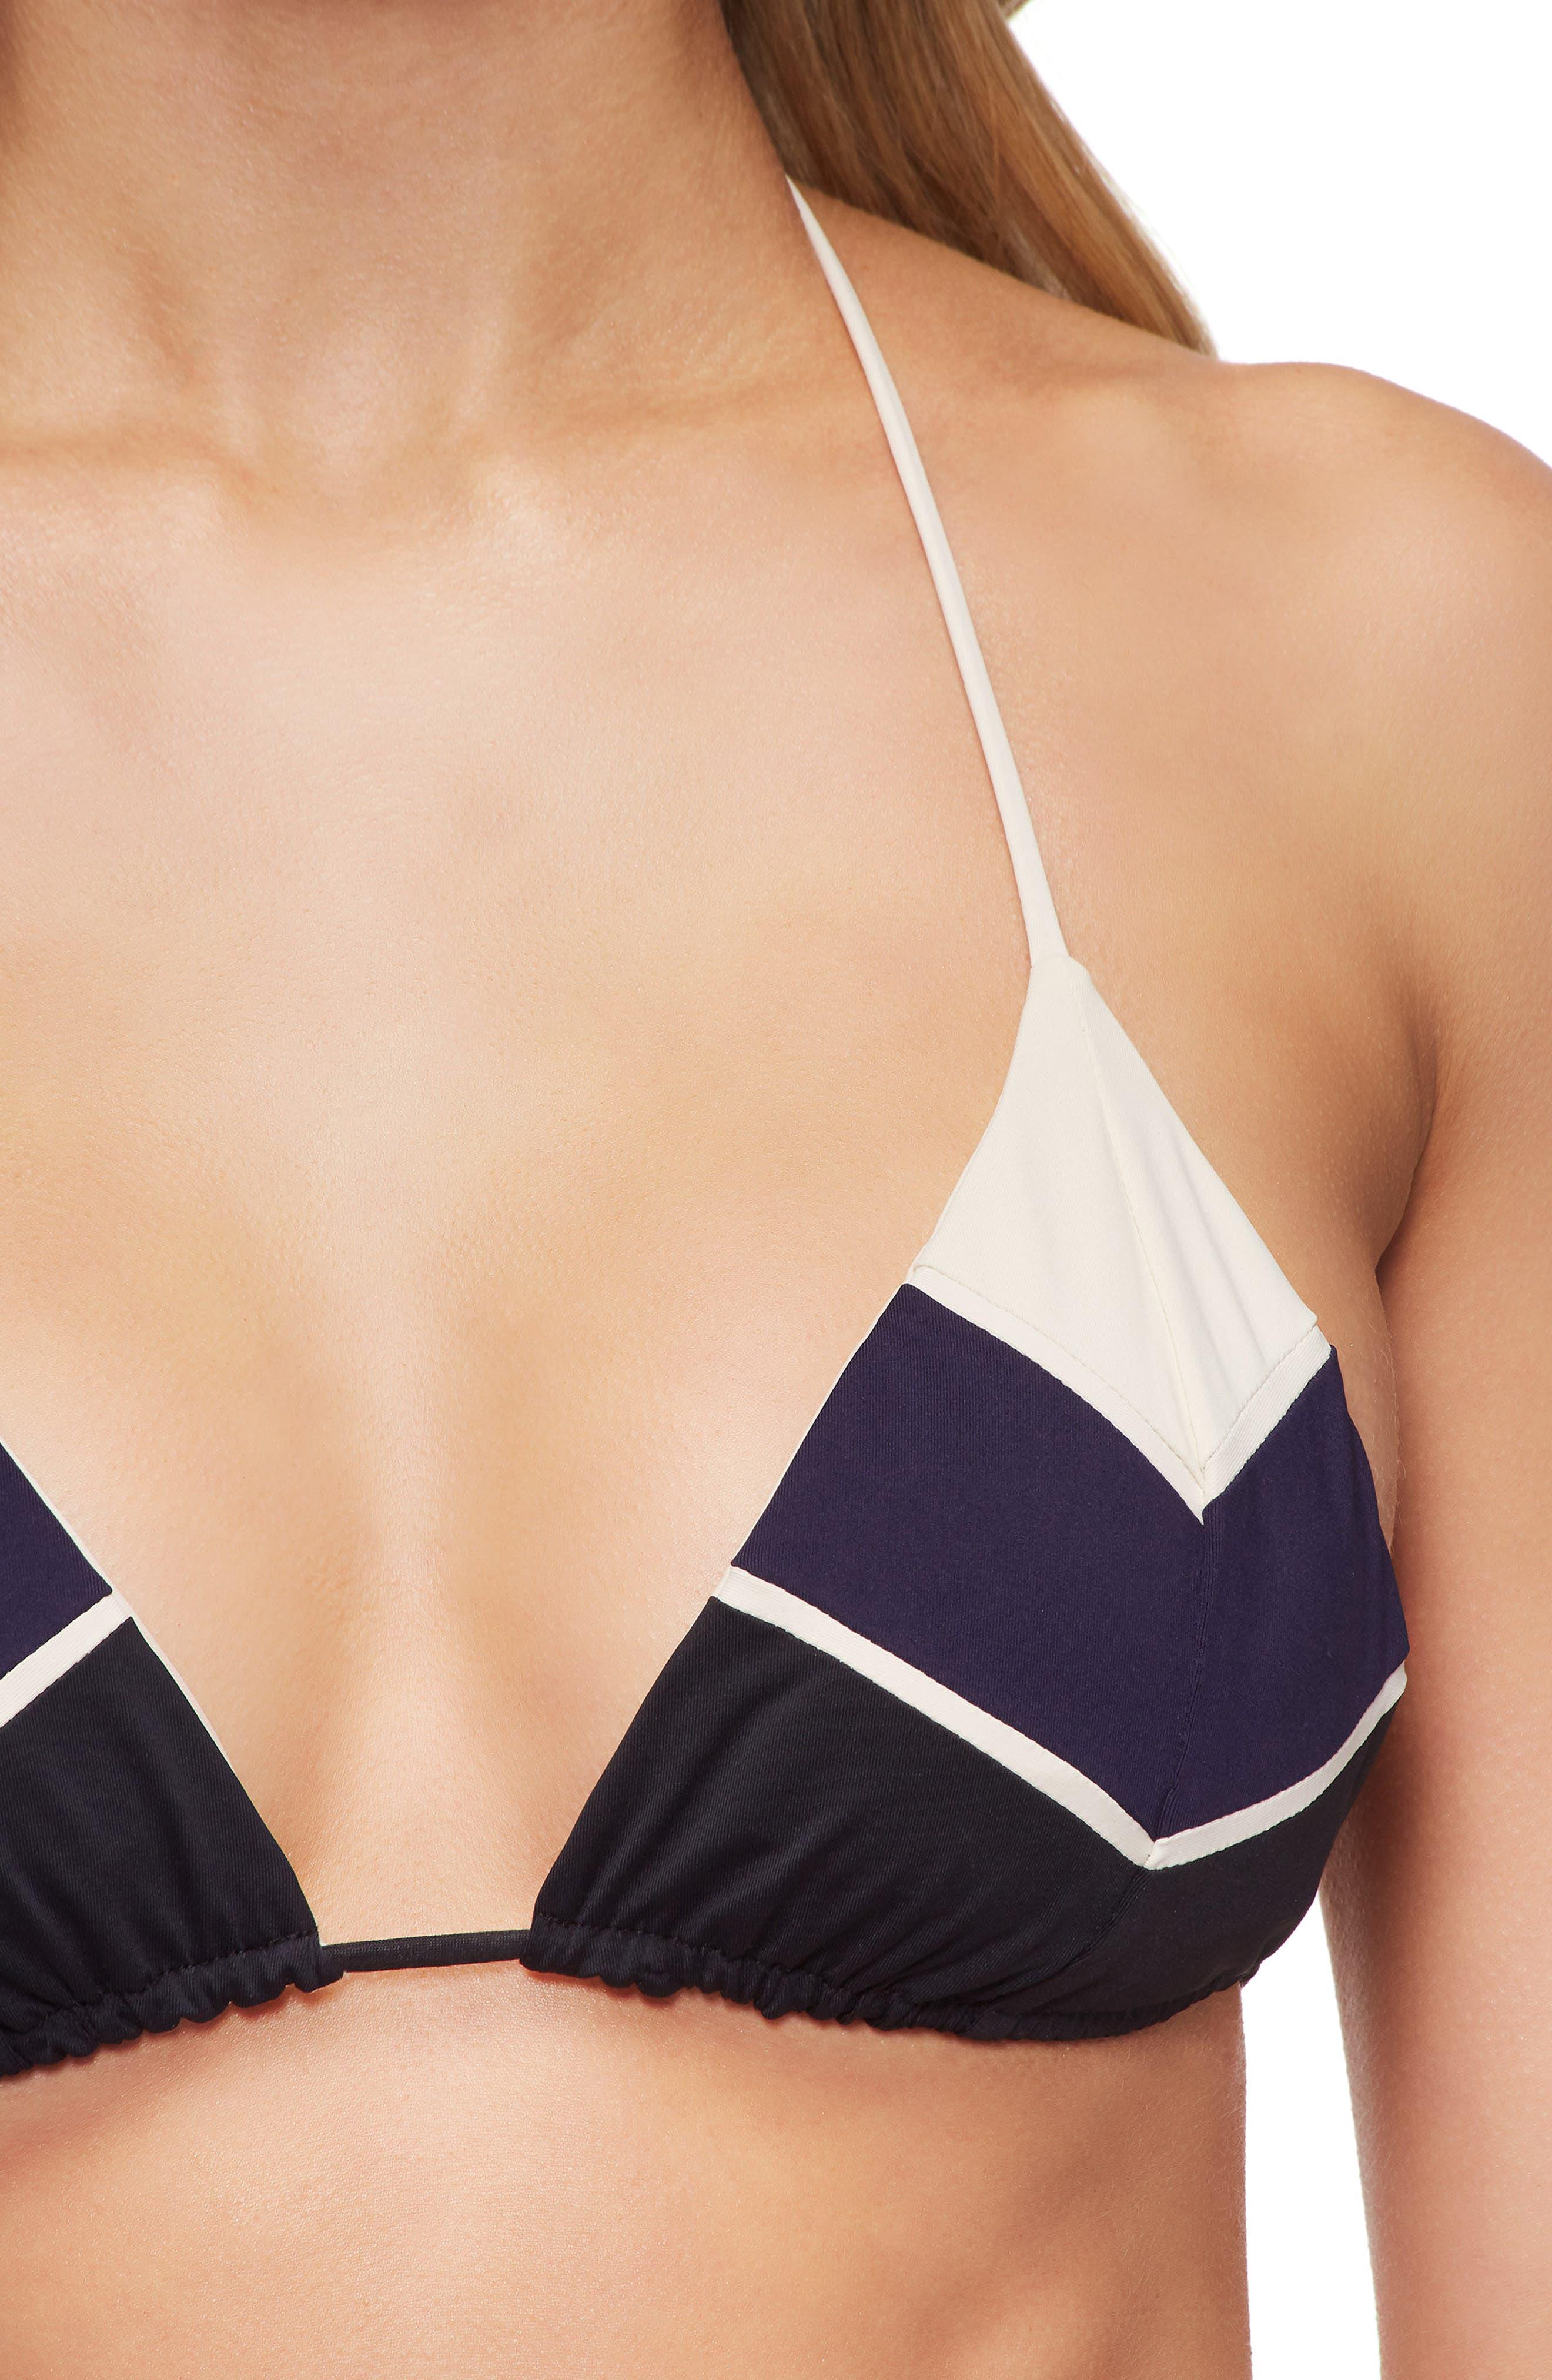 Swimwear Lea Triangle Bikini Top,                             Alternate thumbnail 4, color,                             TAPIOCA/EVENING BLUE